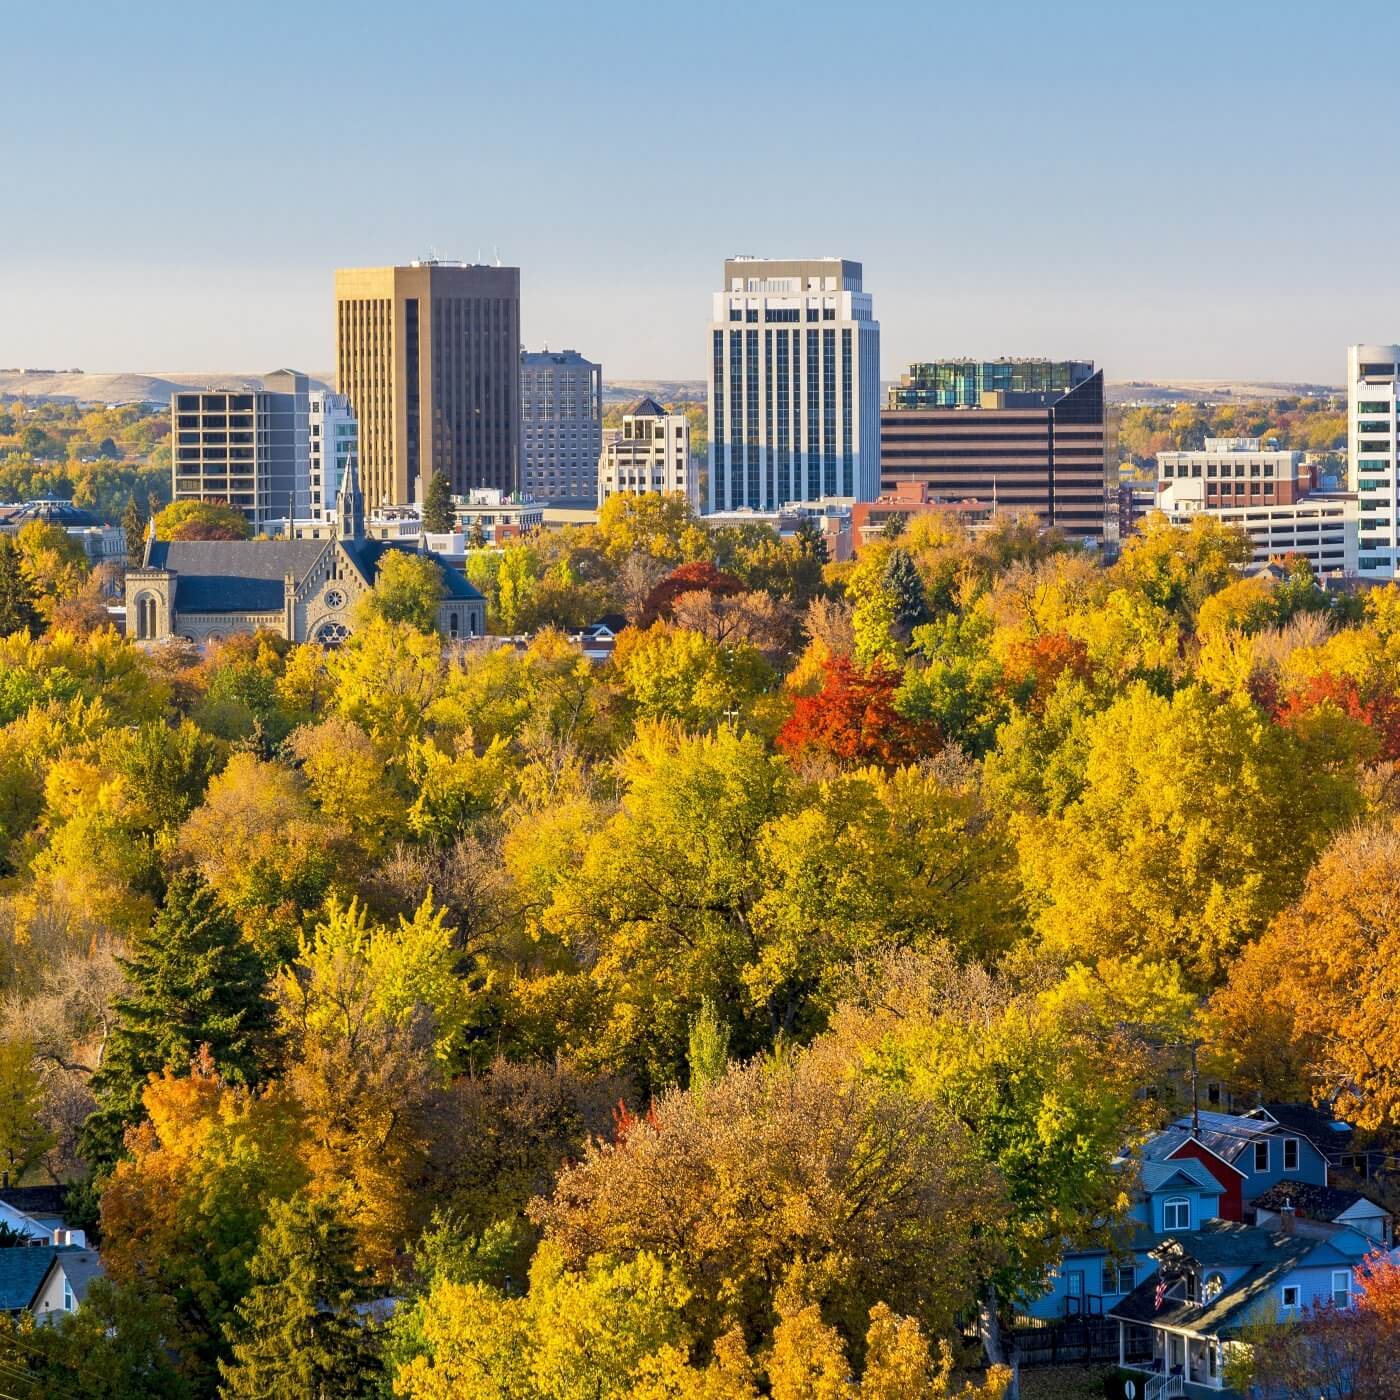 Scenic view of Boise, Idaho